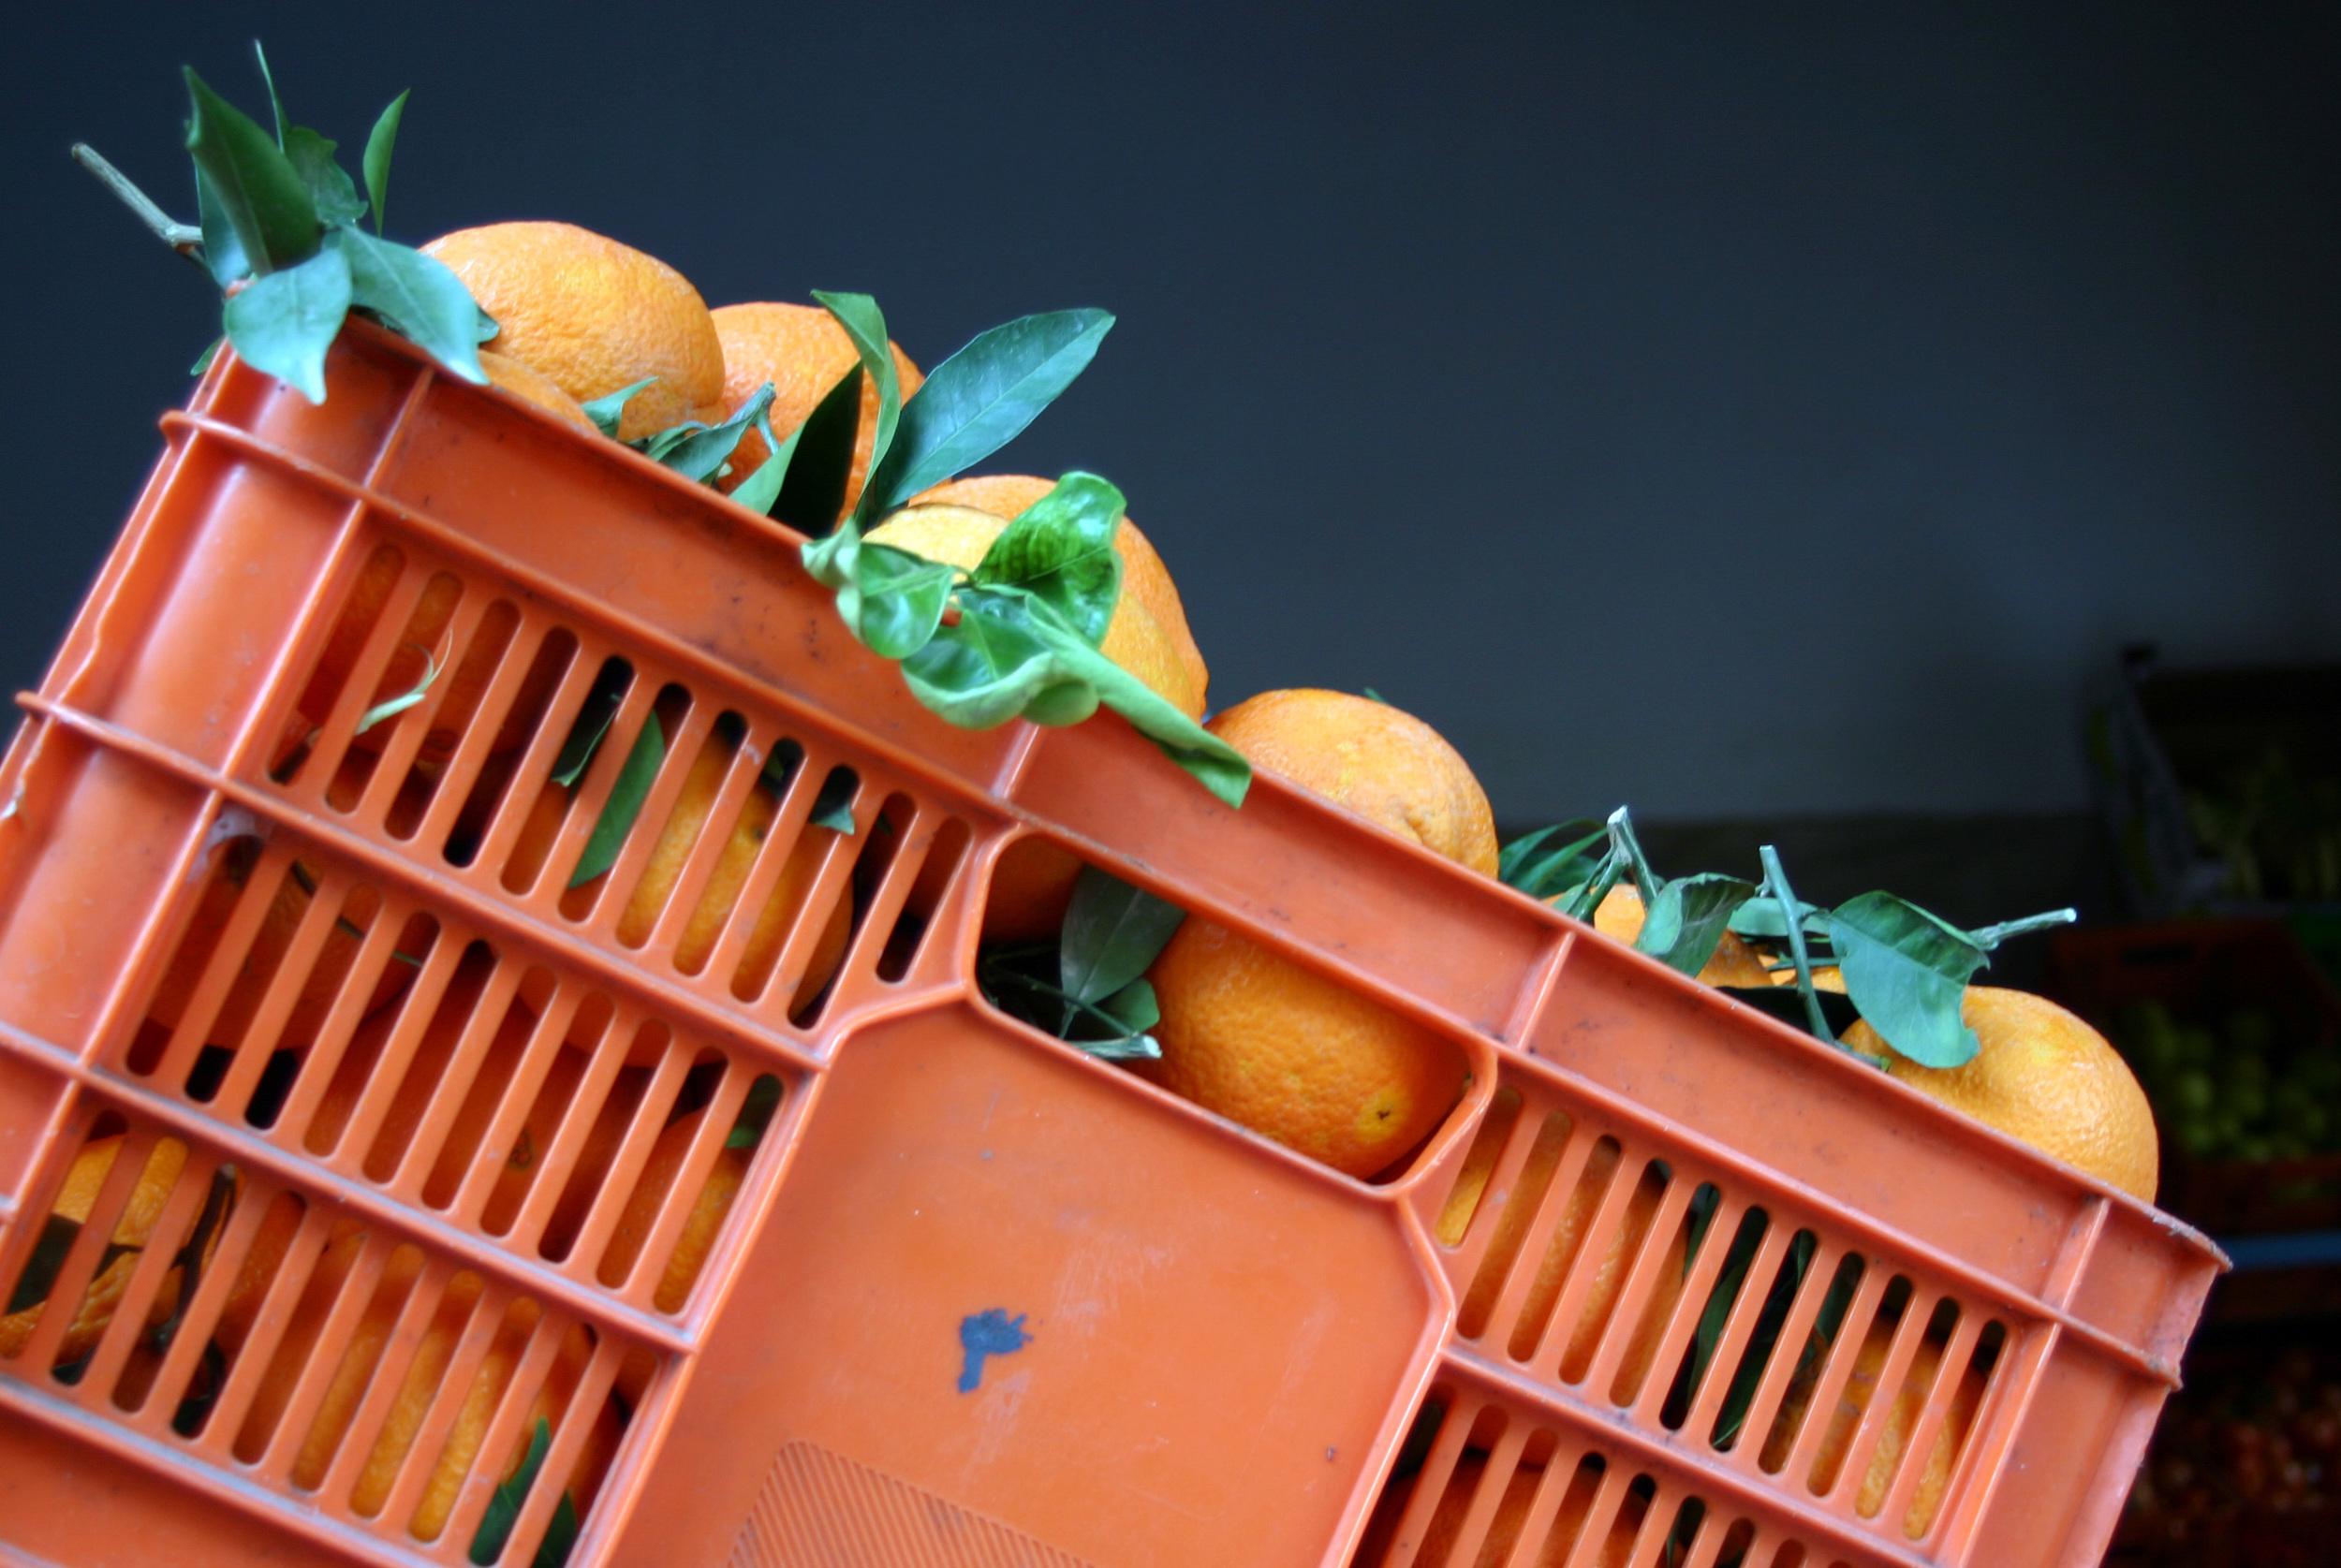 akko oranges.jpg